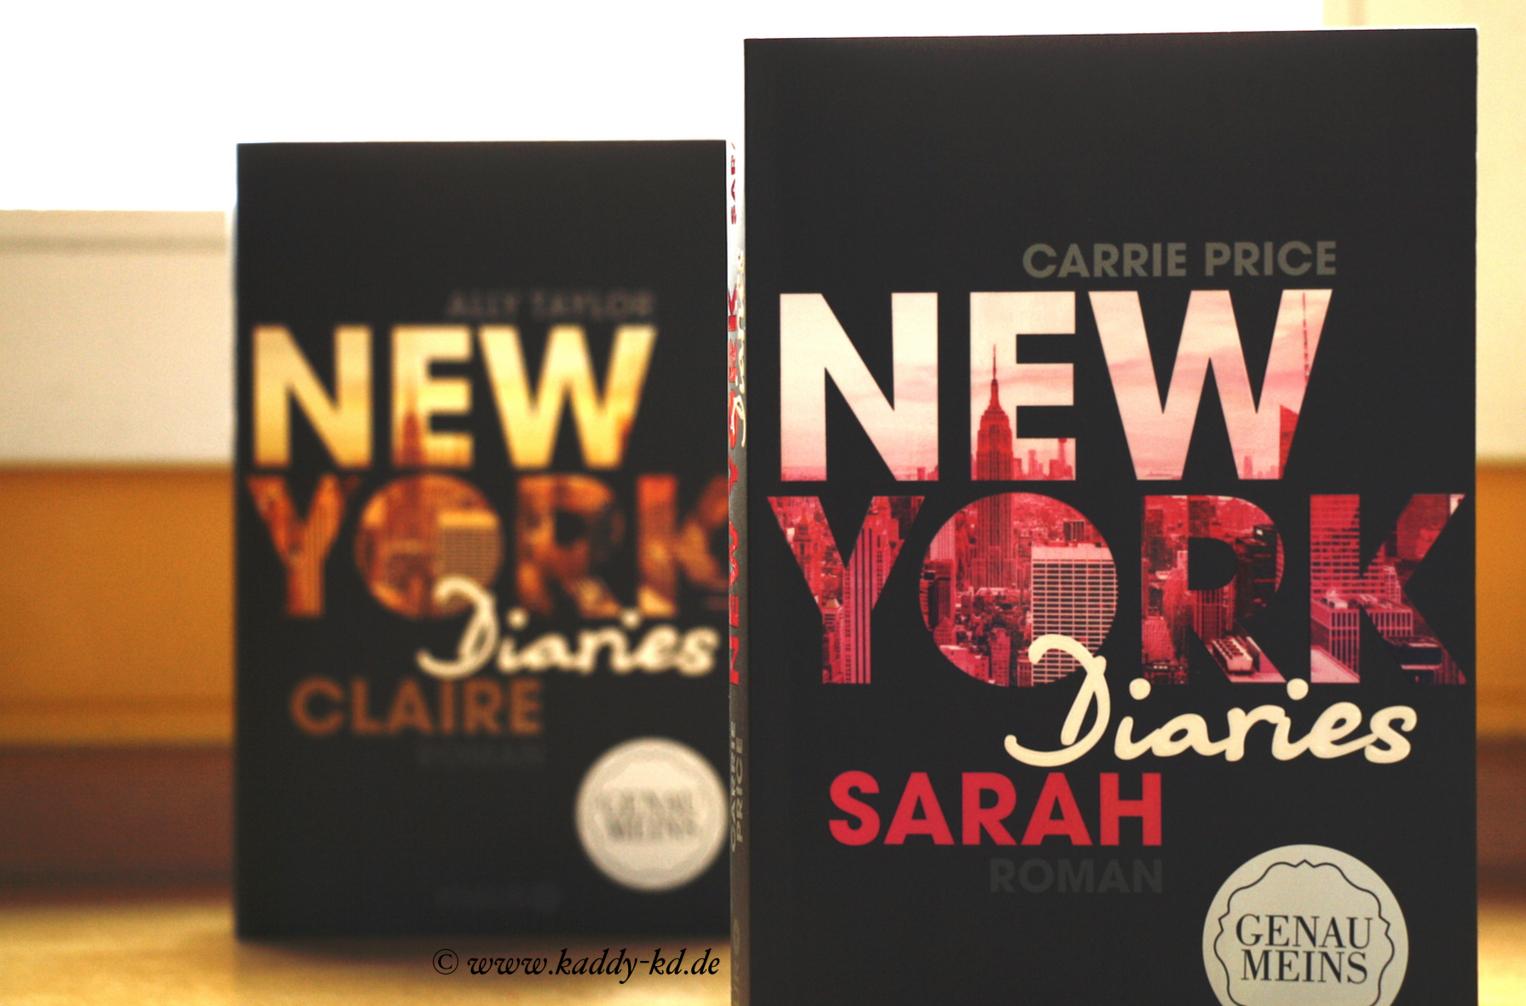 New York Diaries Reihe Sarah und Claire